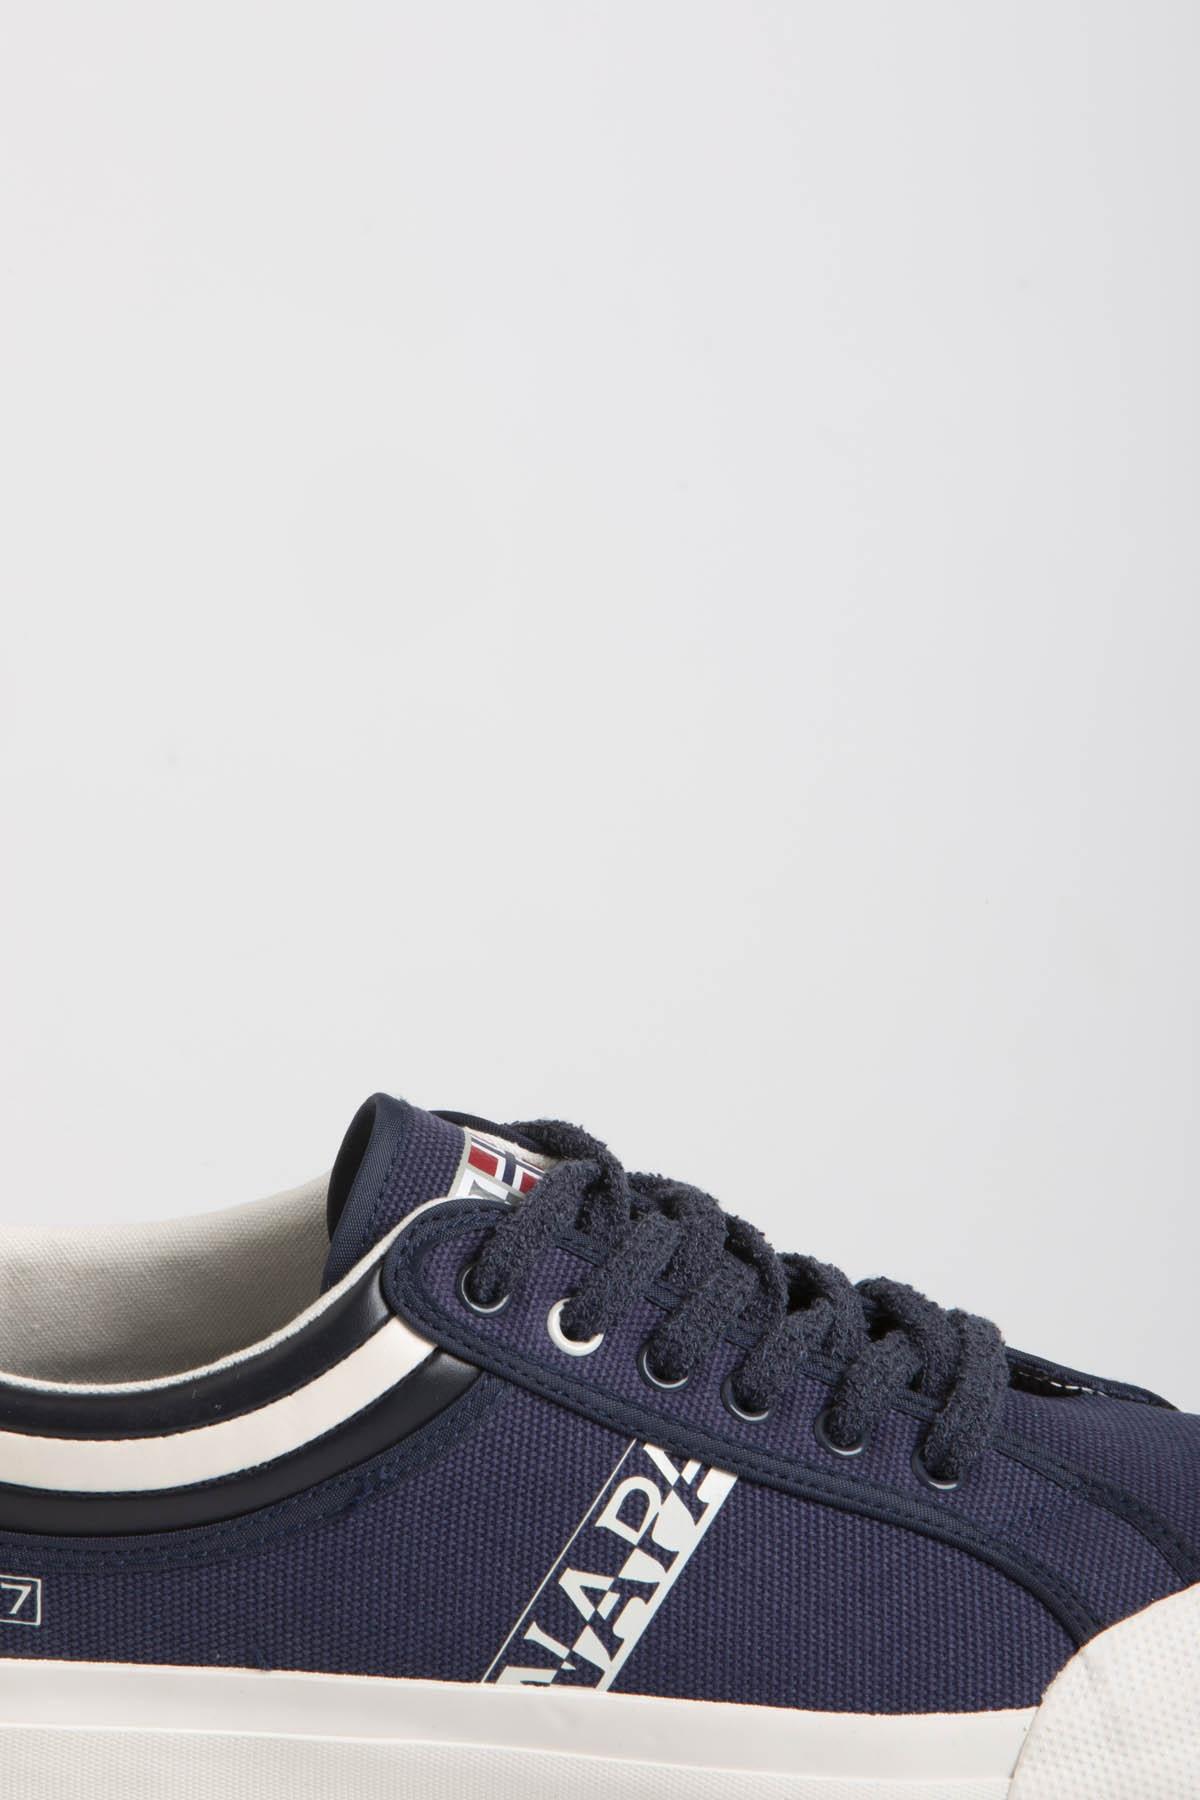 TRICK Sneakers for man NAPAPIJRI S/S 19